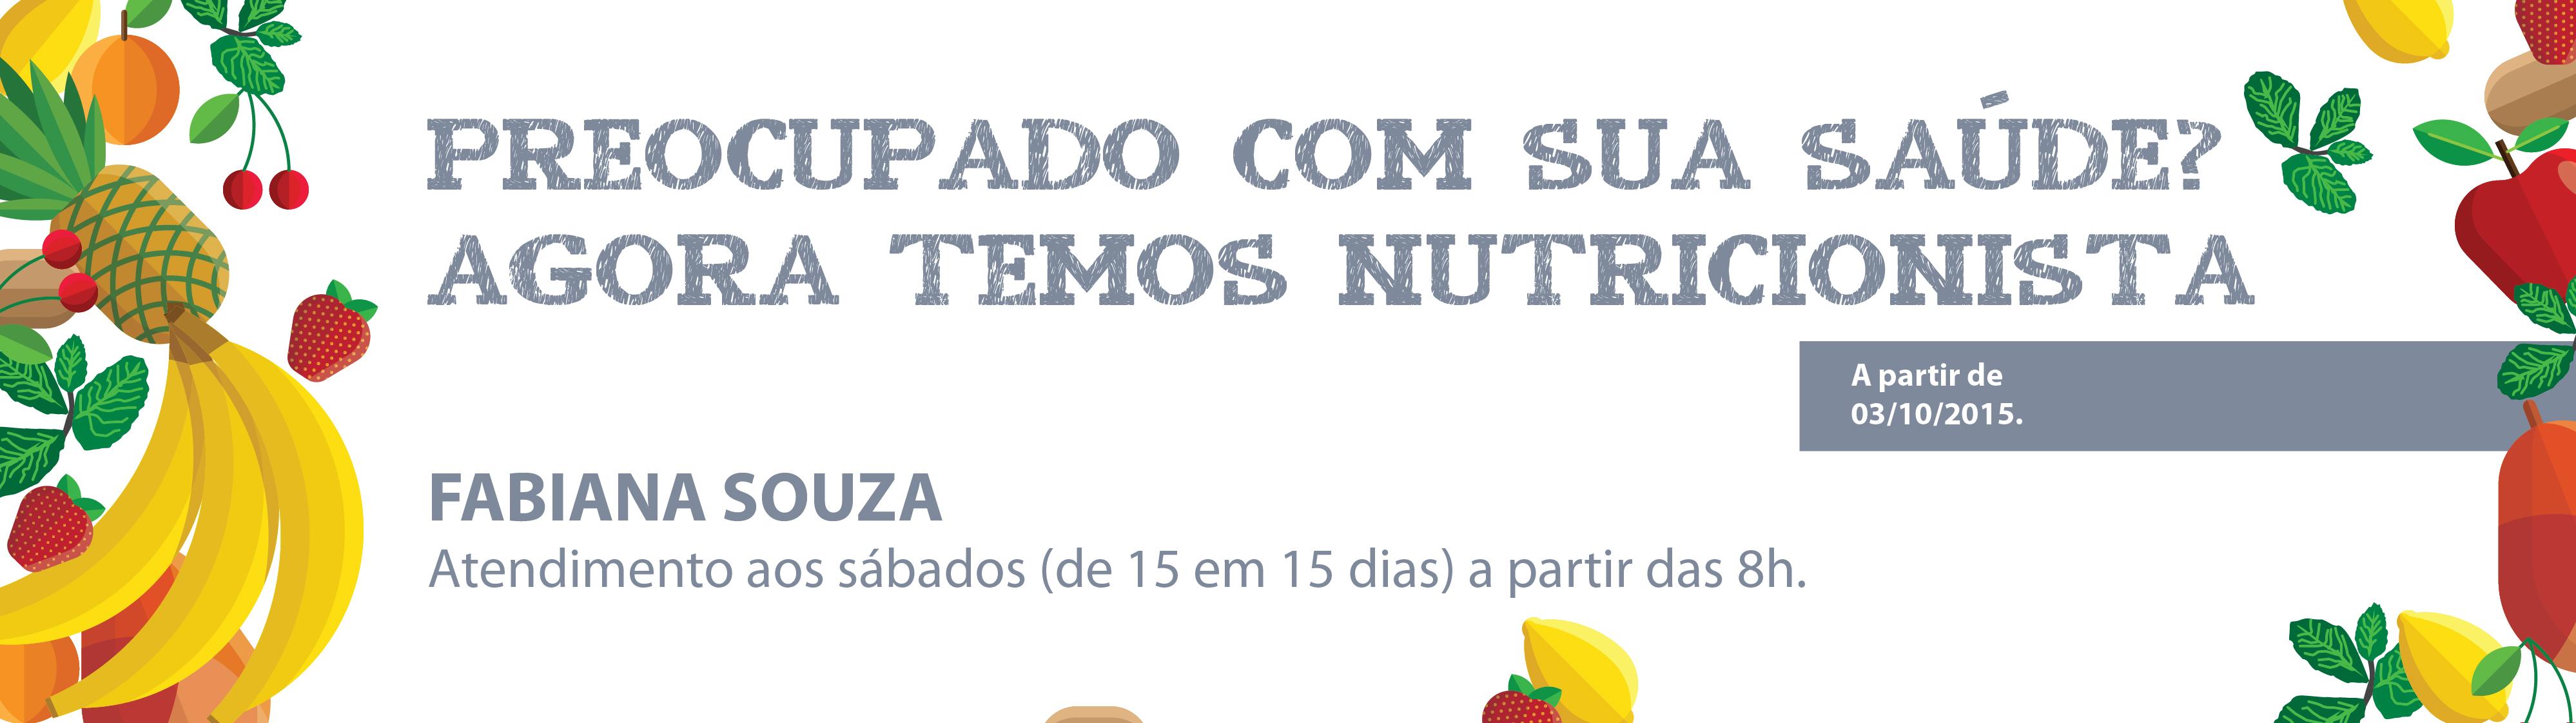 banner-nutricionista-01